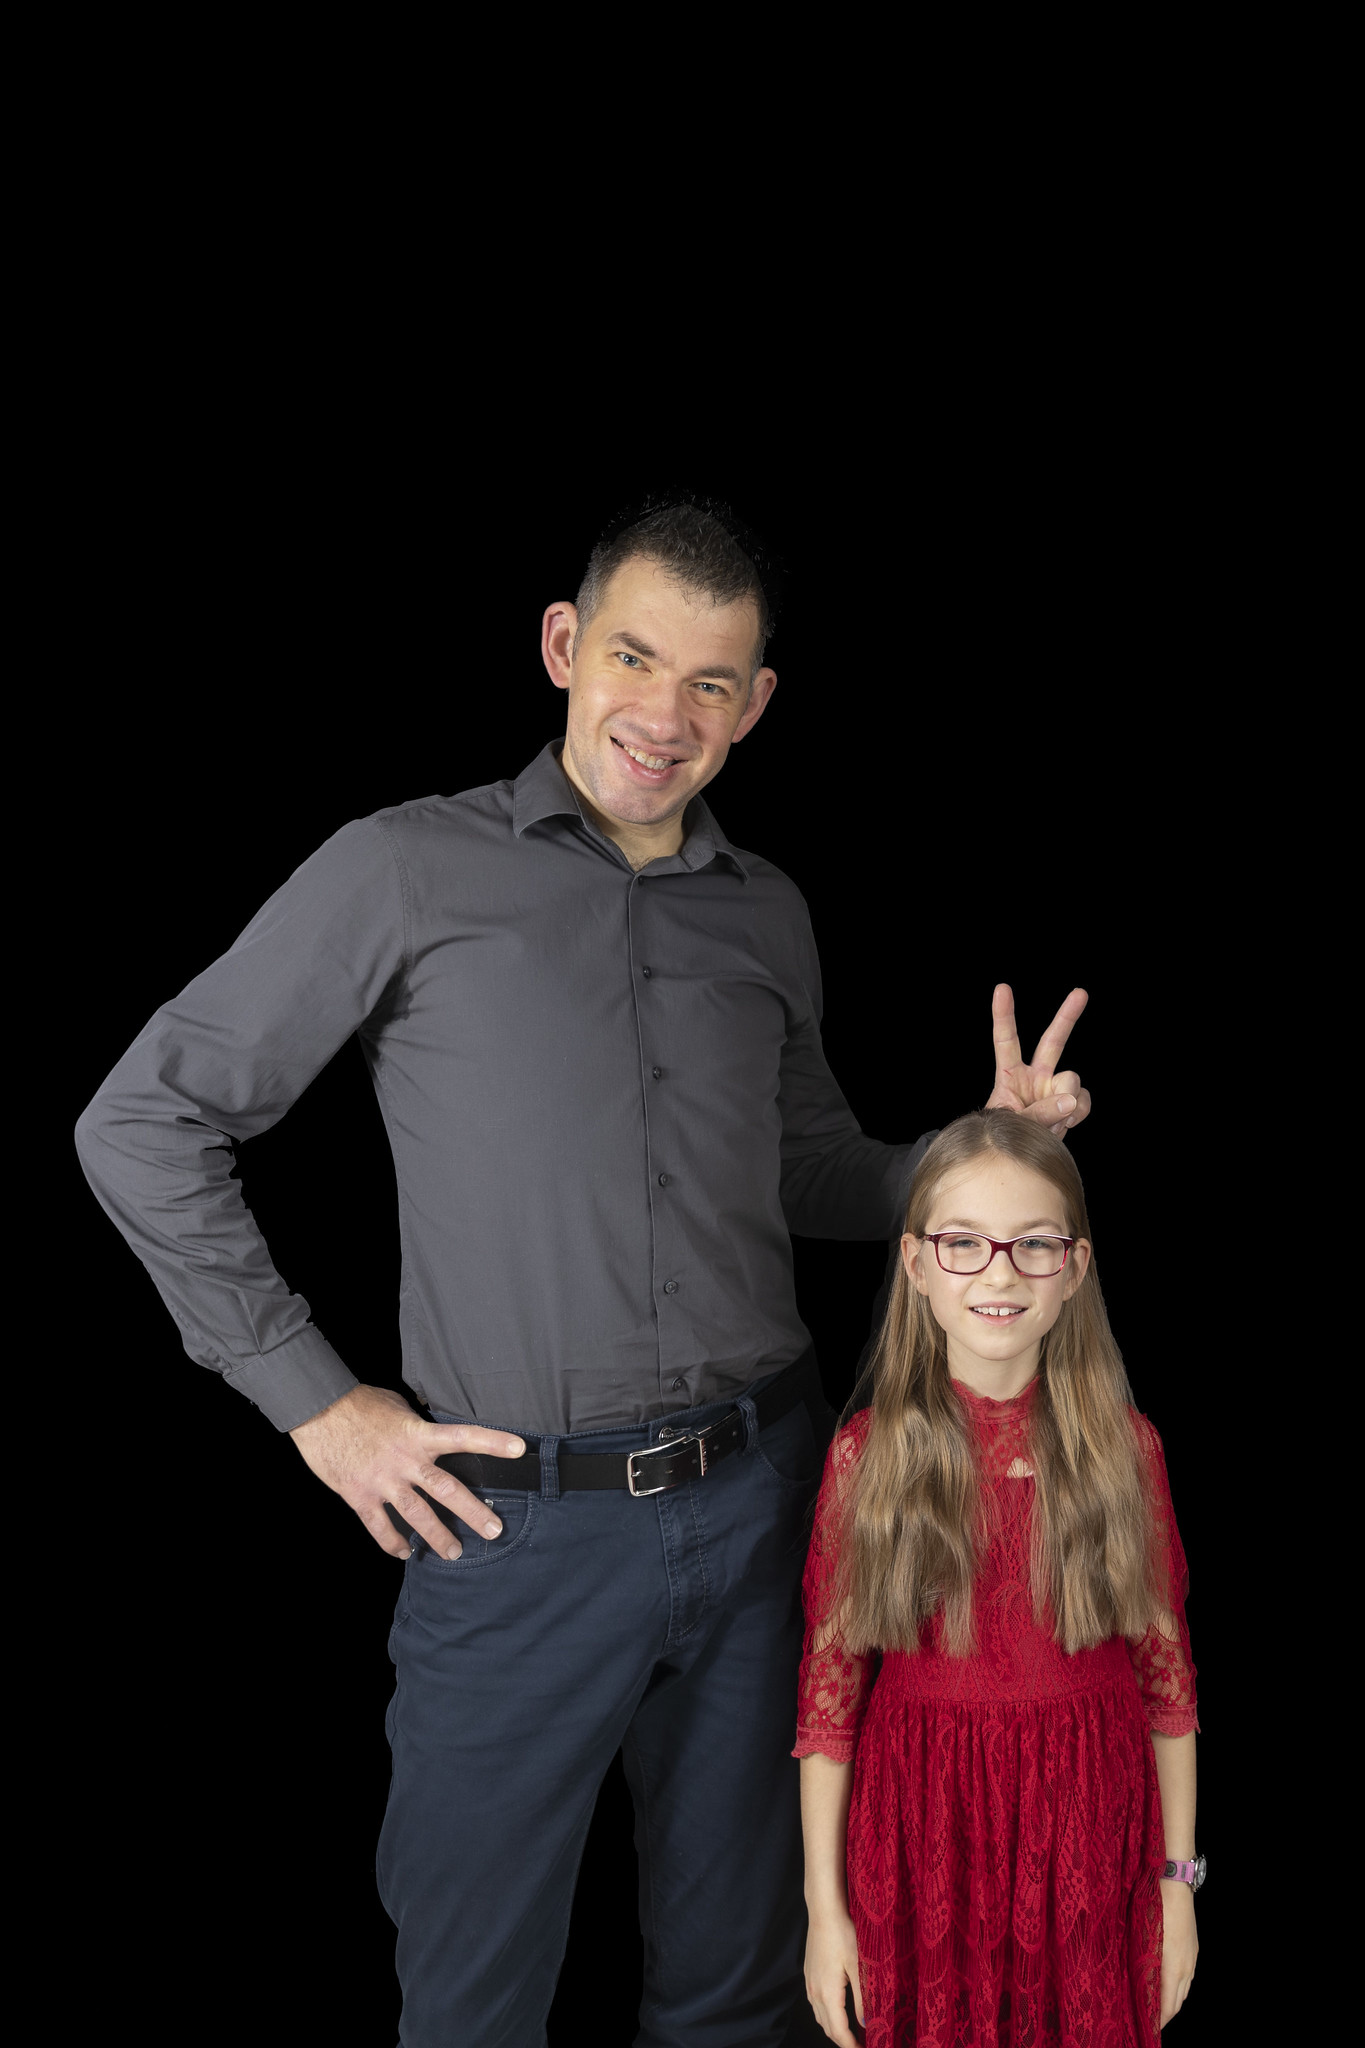 Fotoshooting Familie Braun